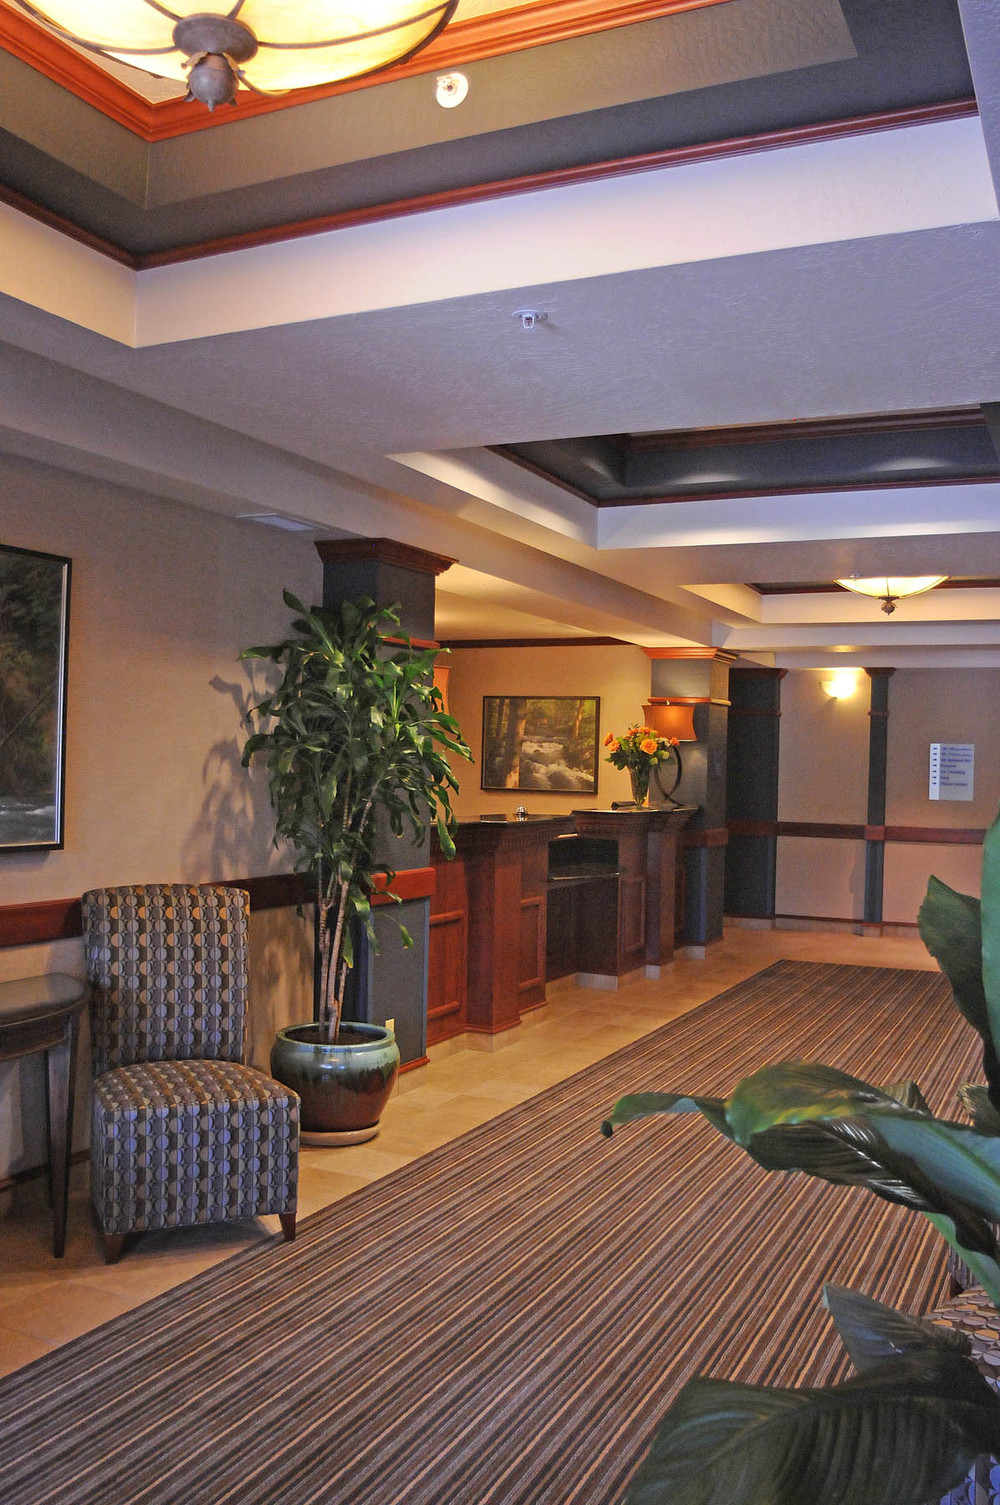 HIE Holiday Inn Lobby vertweb.jpg